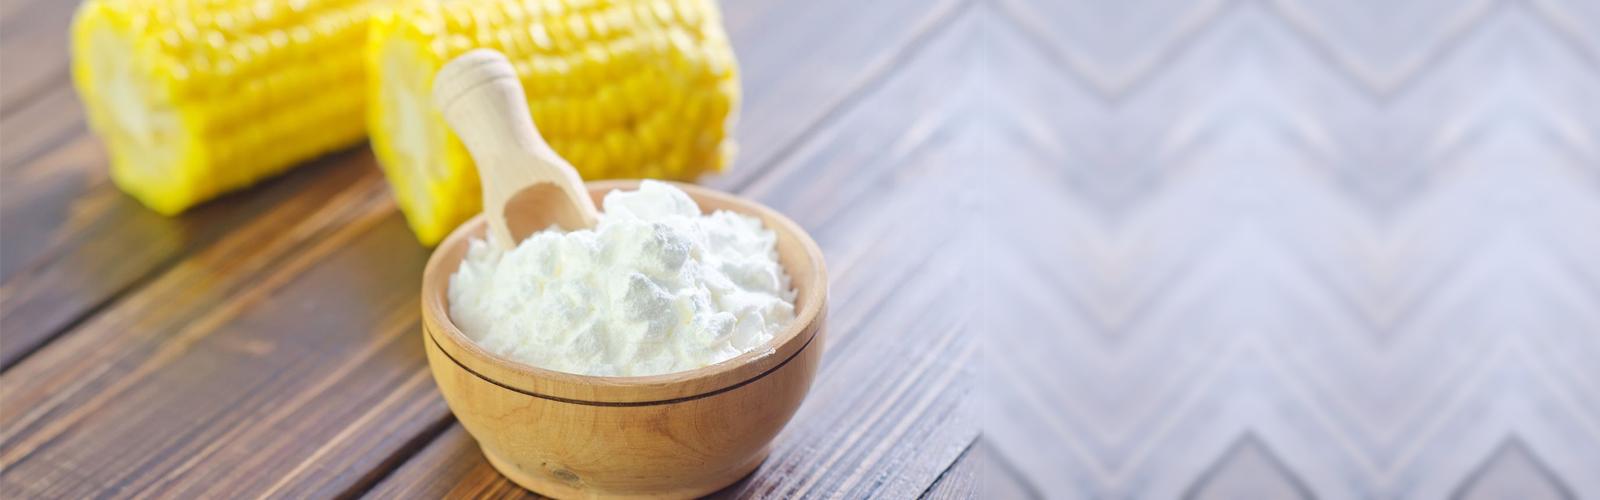 Natural Corn Starch